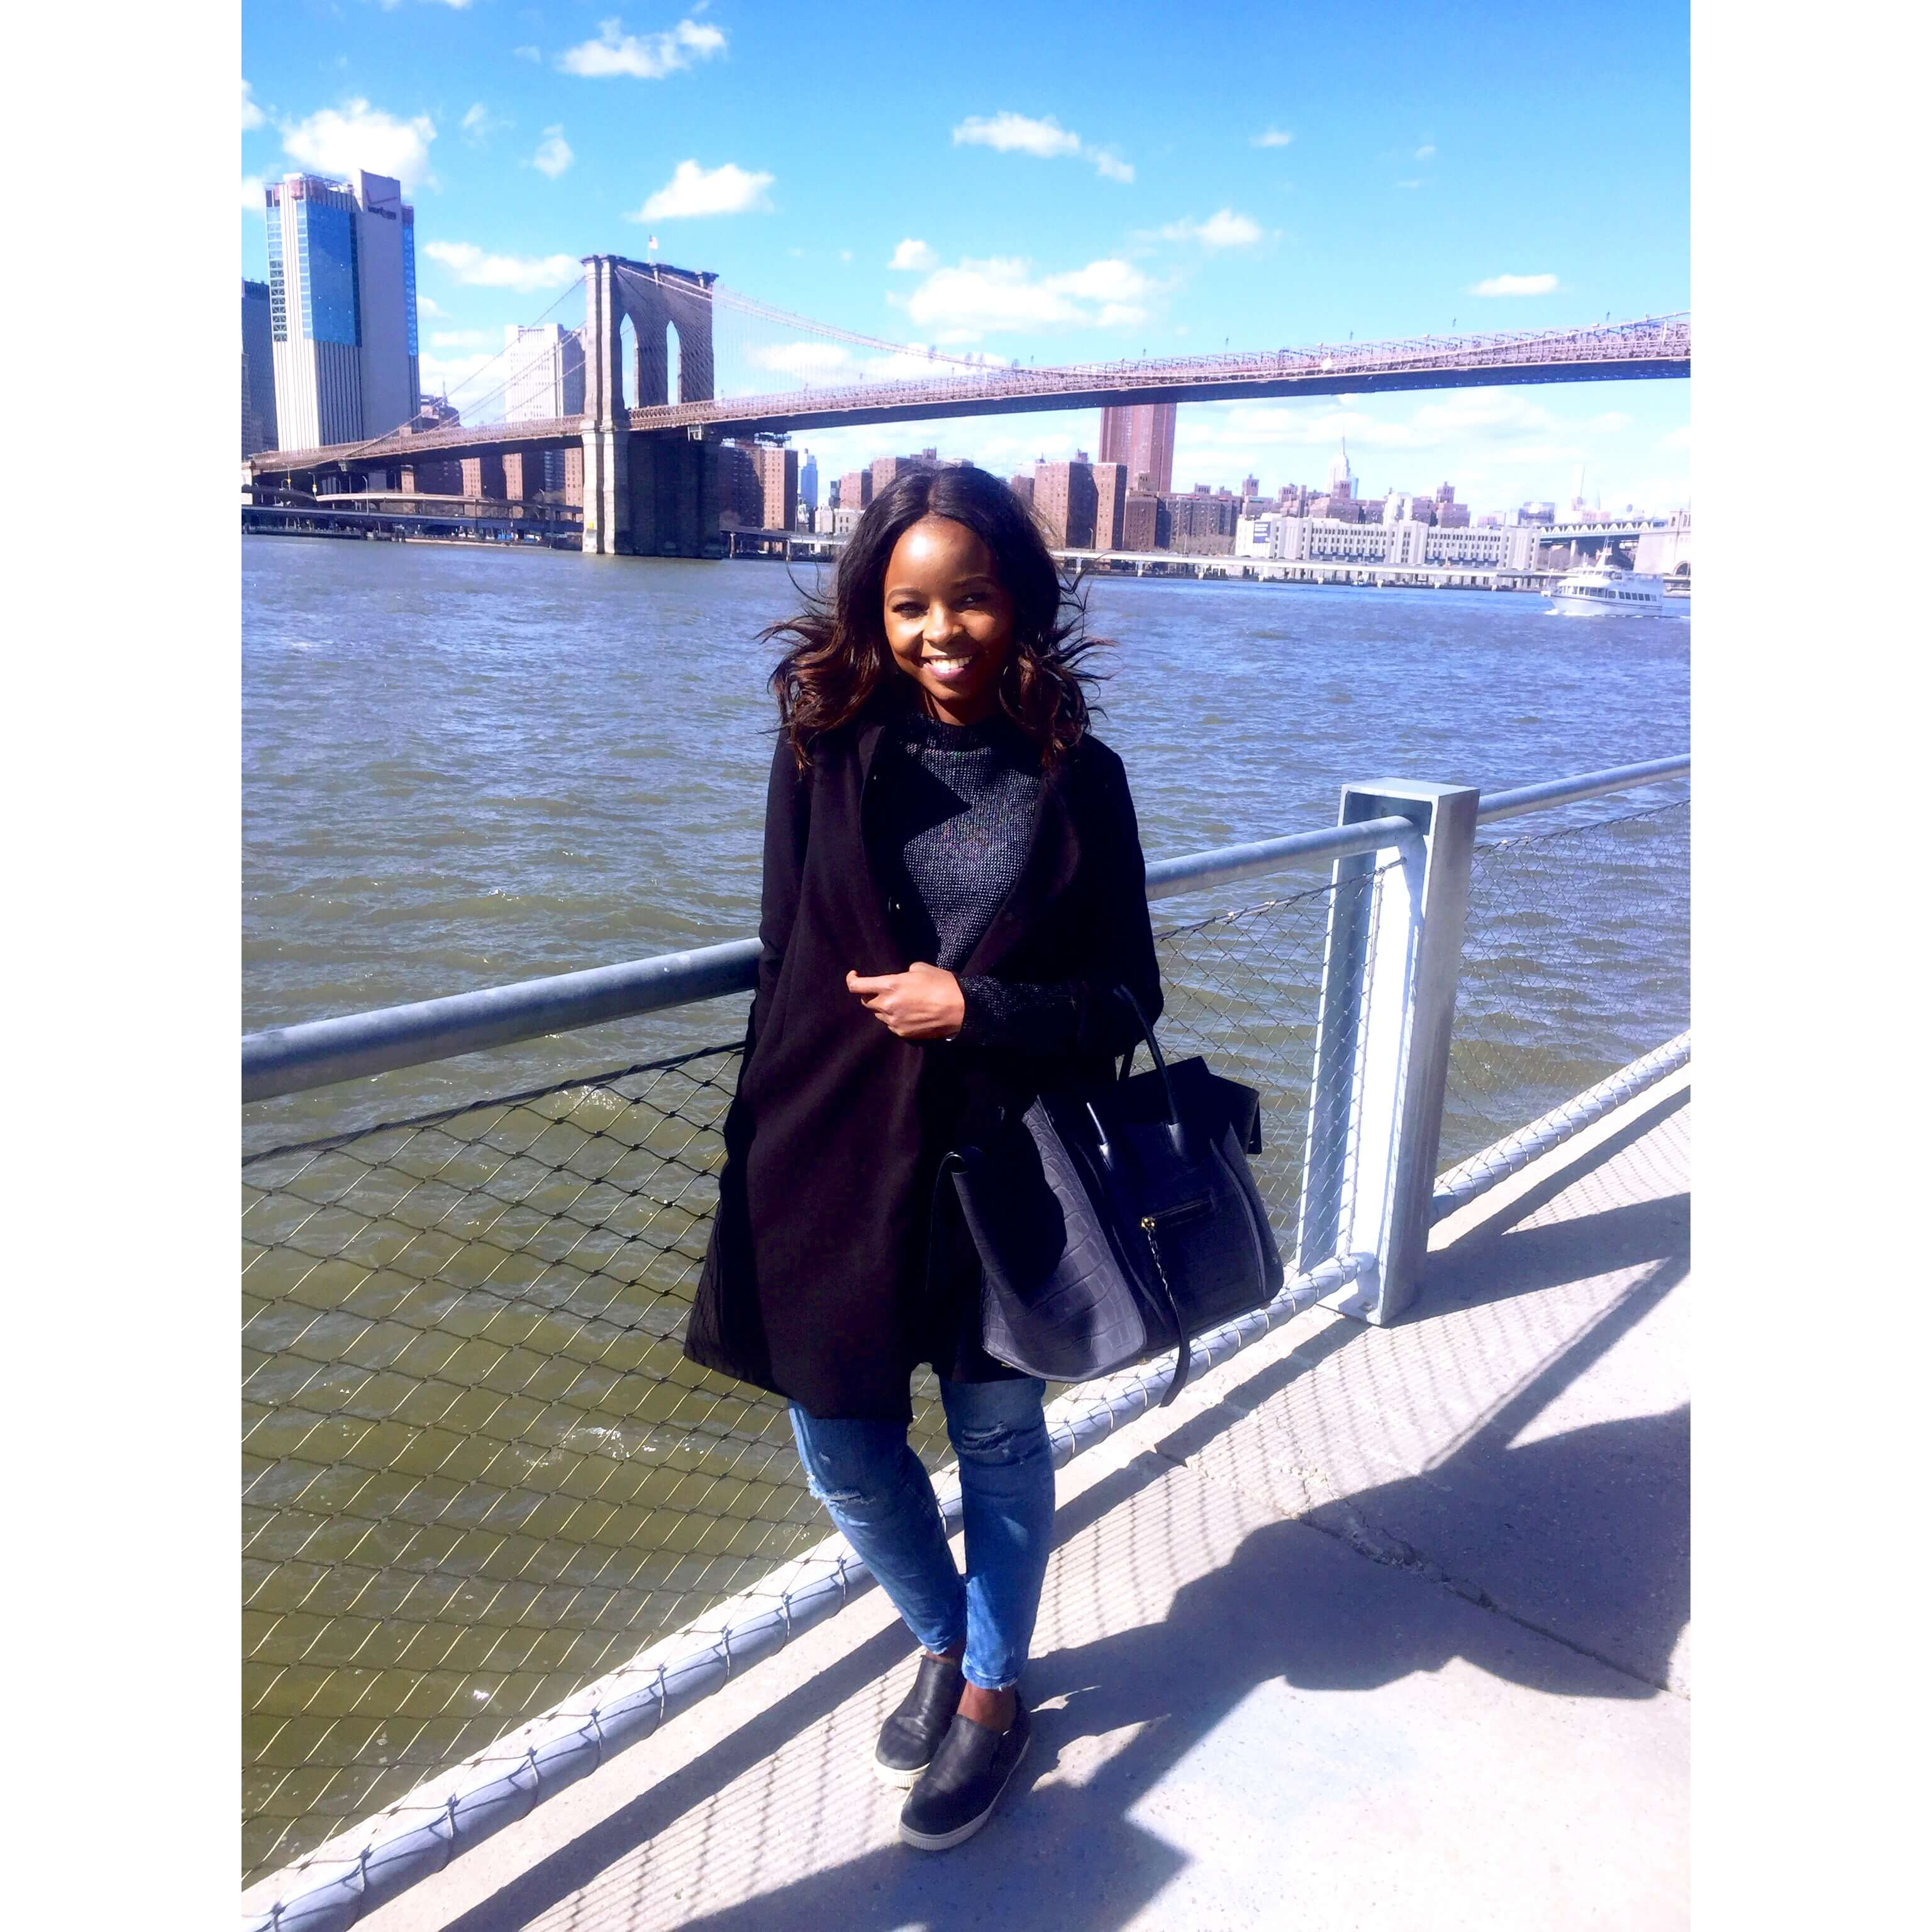 Brooklyn Bridge - For Raha and Lemons